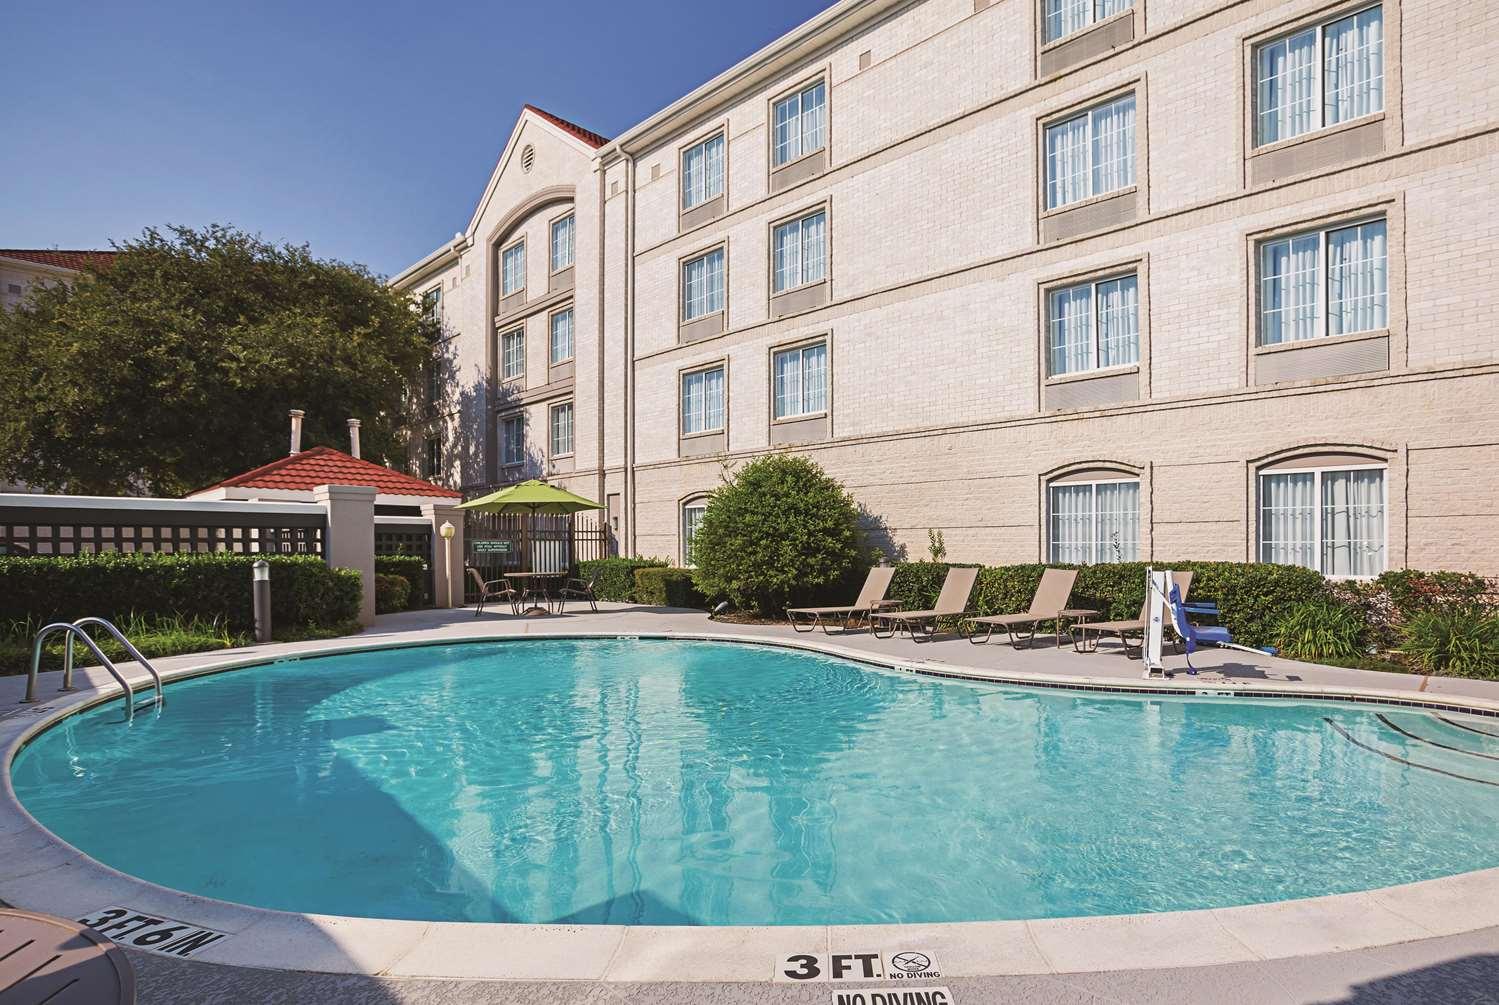 Pool - La Quinta Inn & Suites West Plano